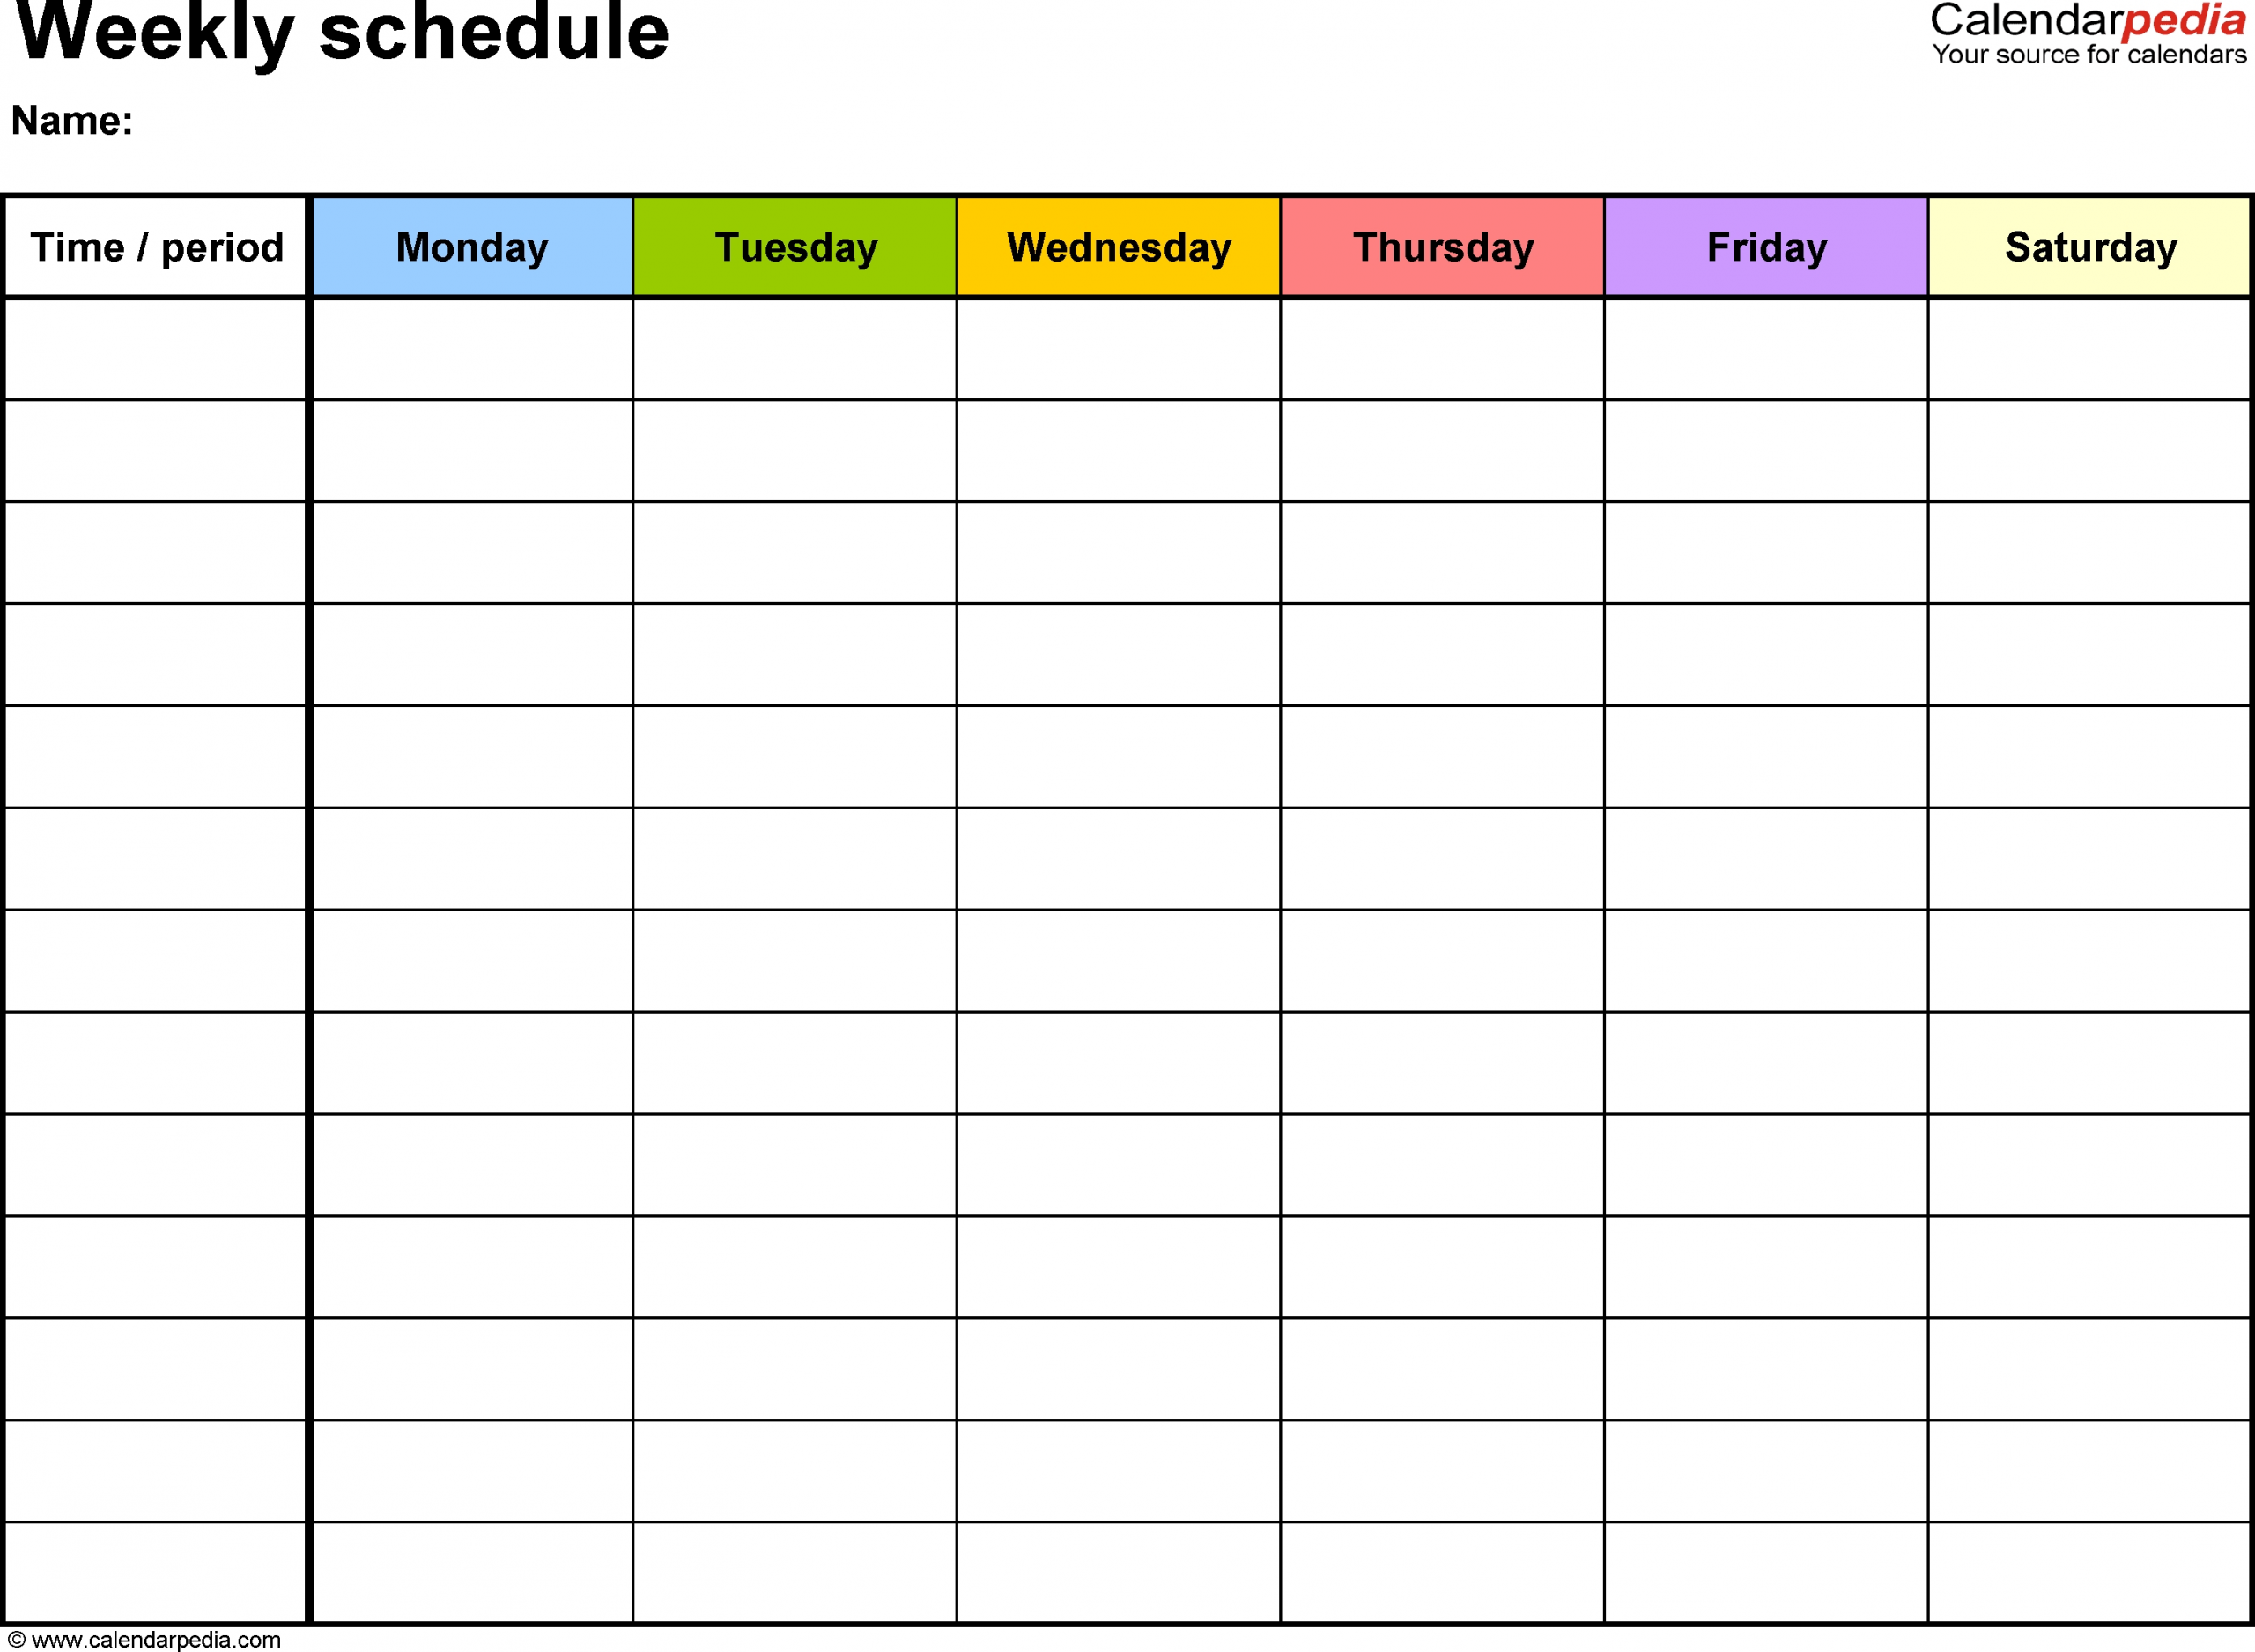 Medroxyprogesterone Perpetual Calendar 12-14 Weeks Depo Provera Leap Year Calendar